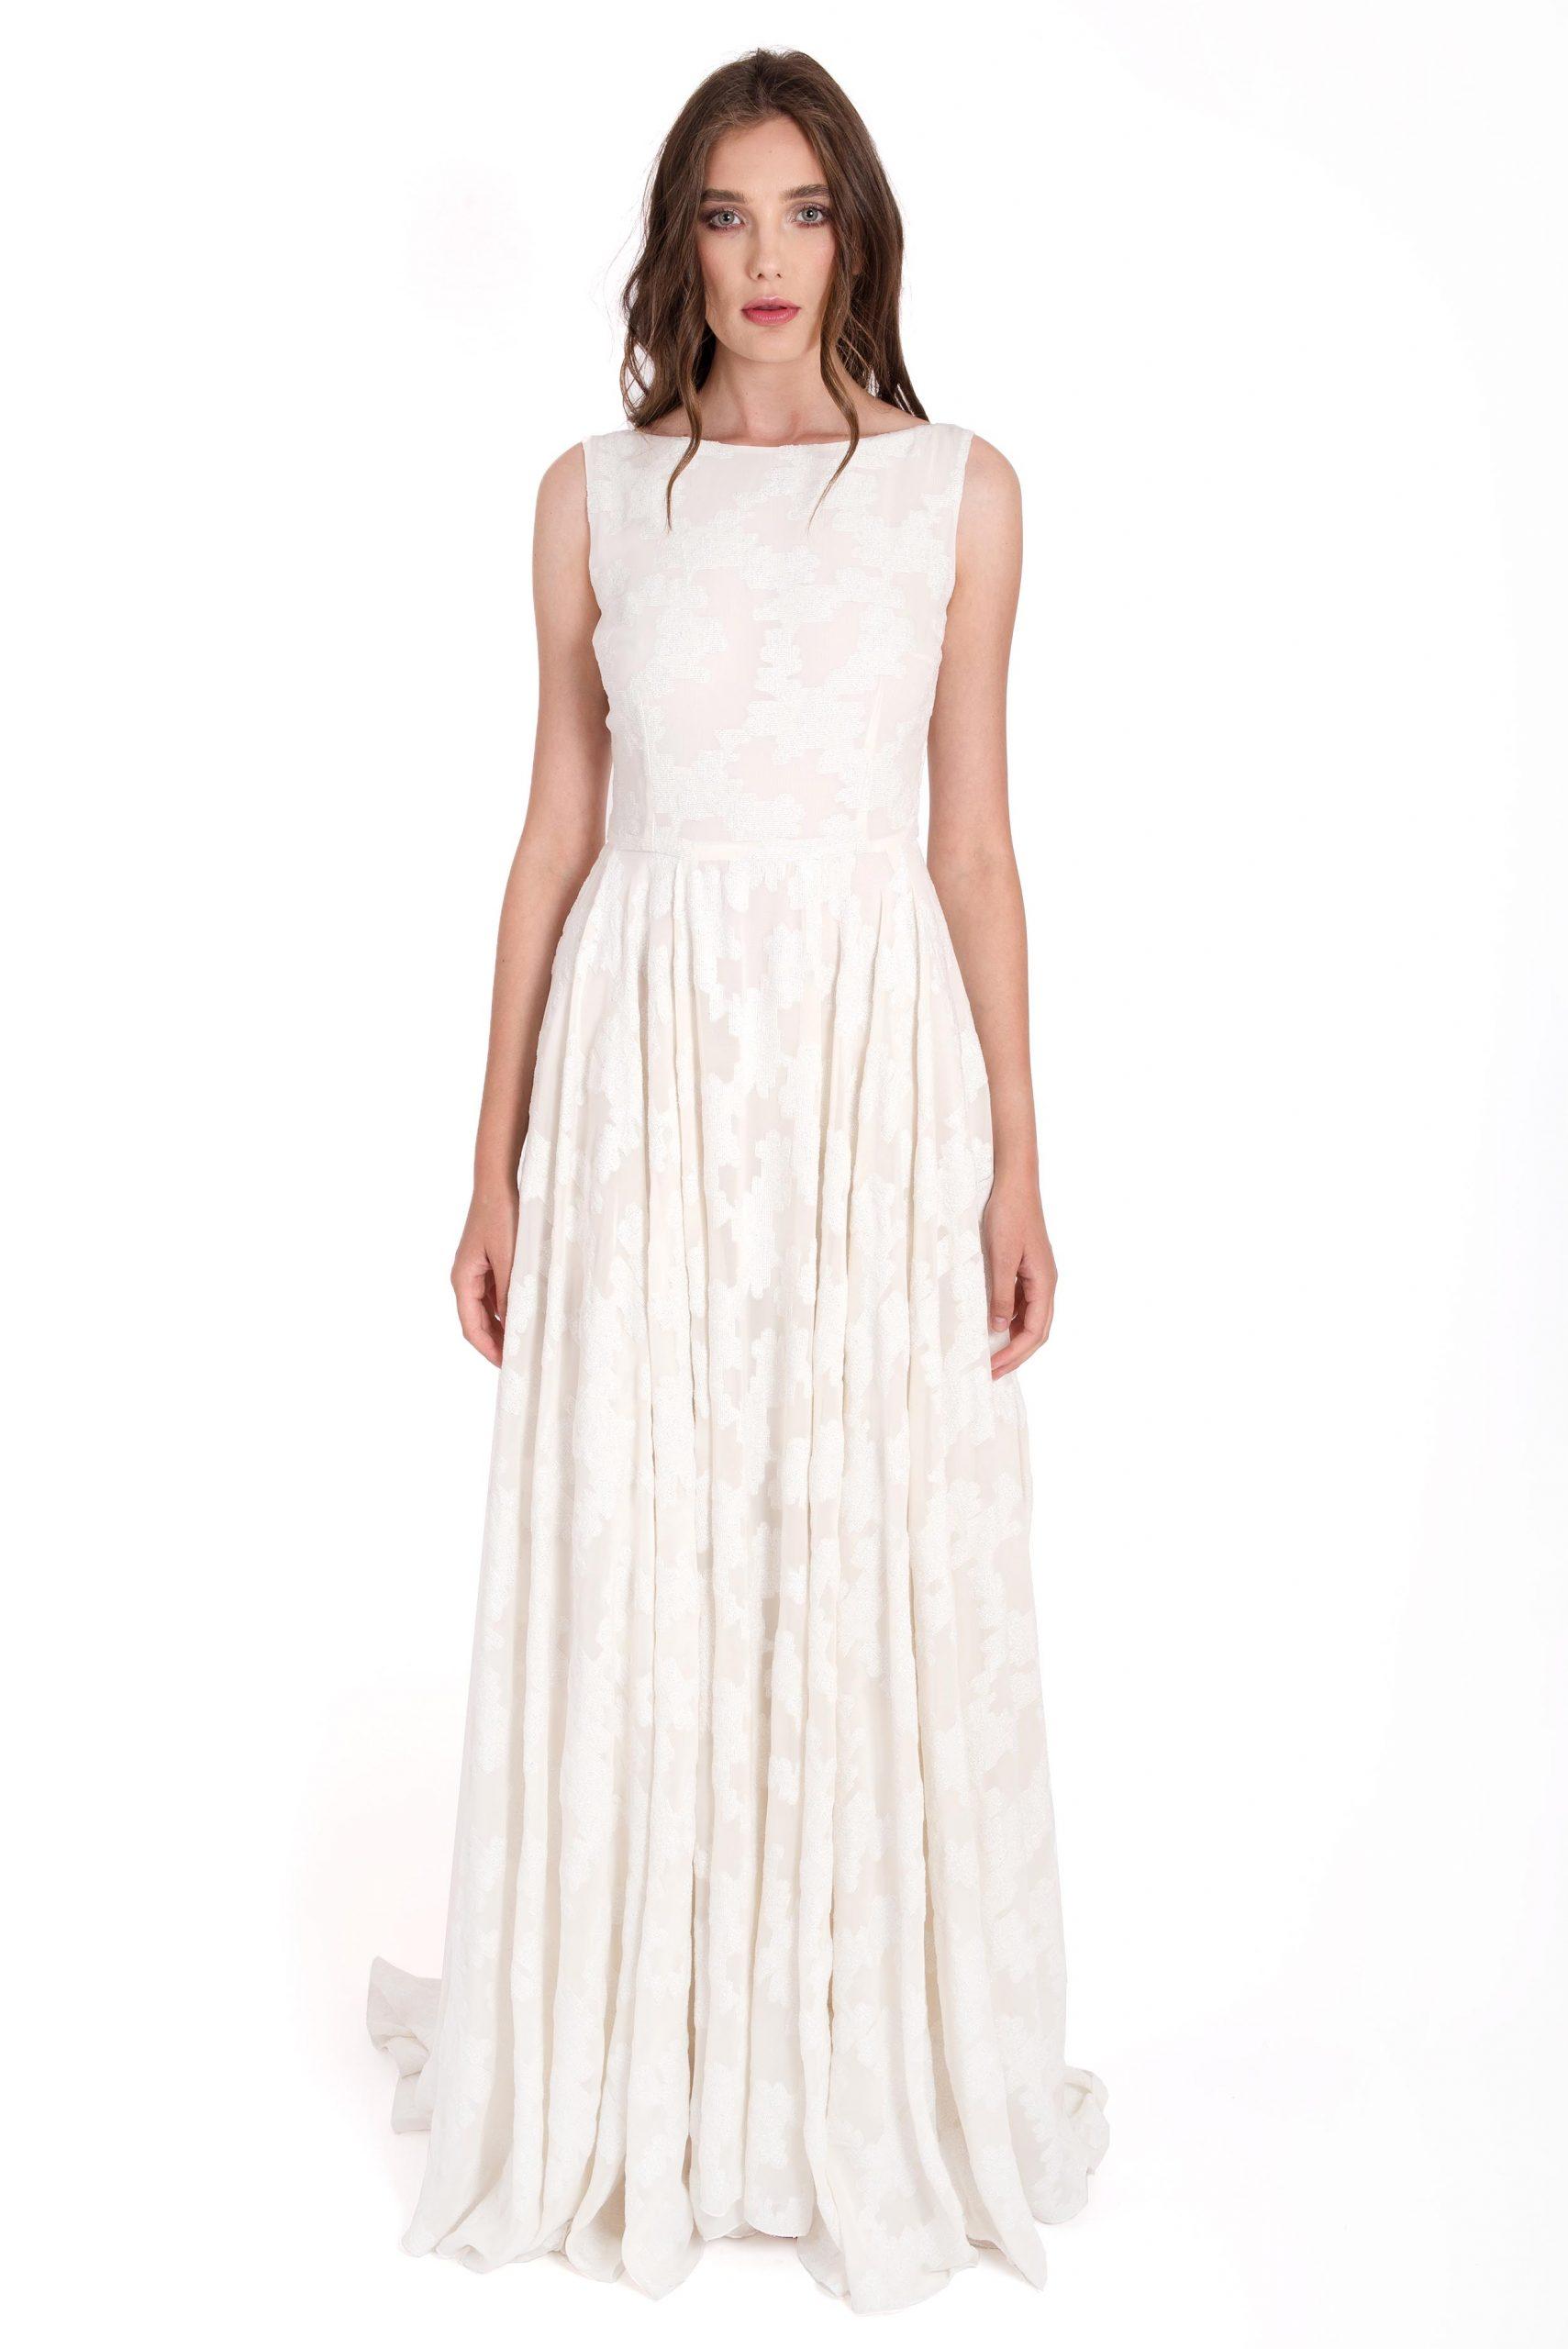 Silk white dress - Izabela Mandoiu